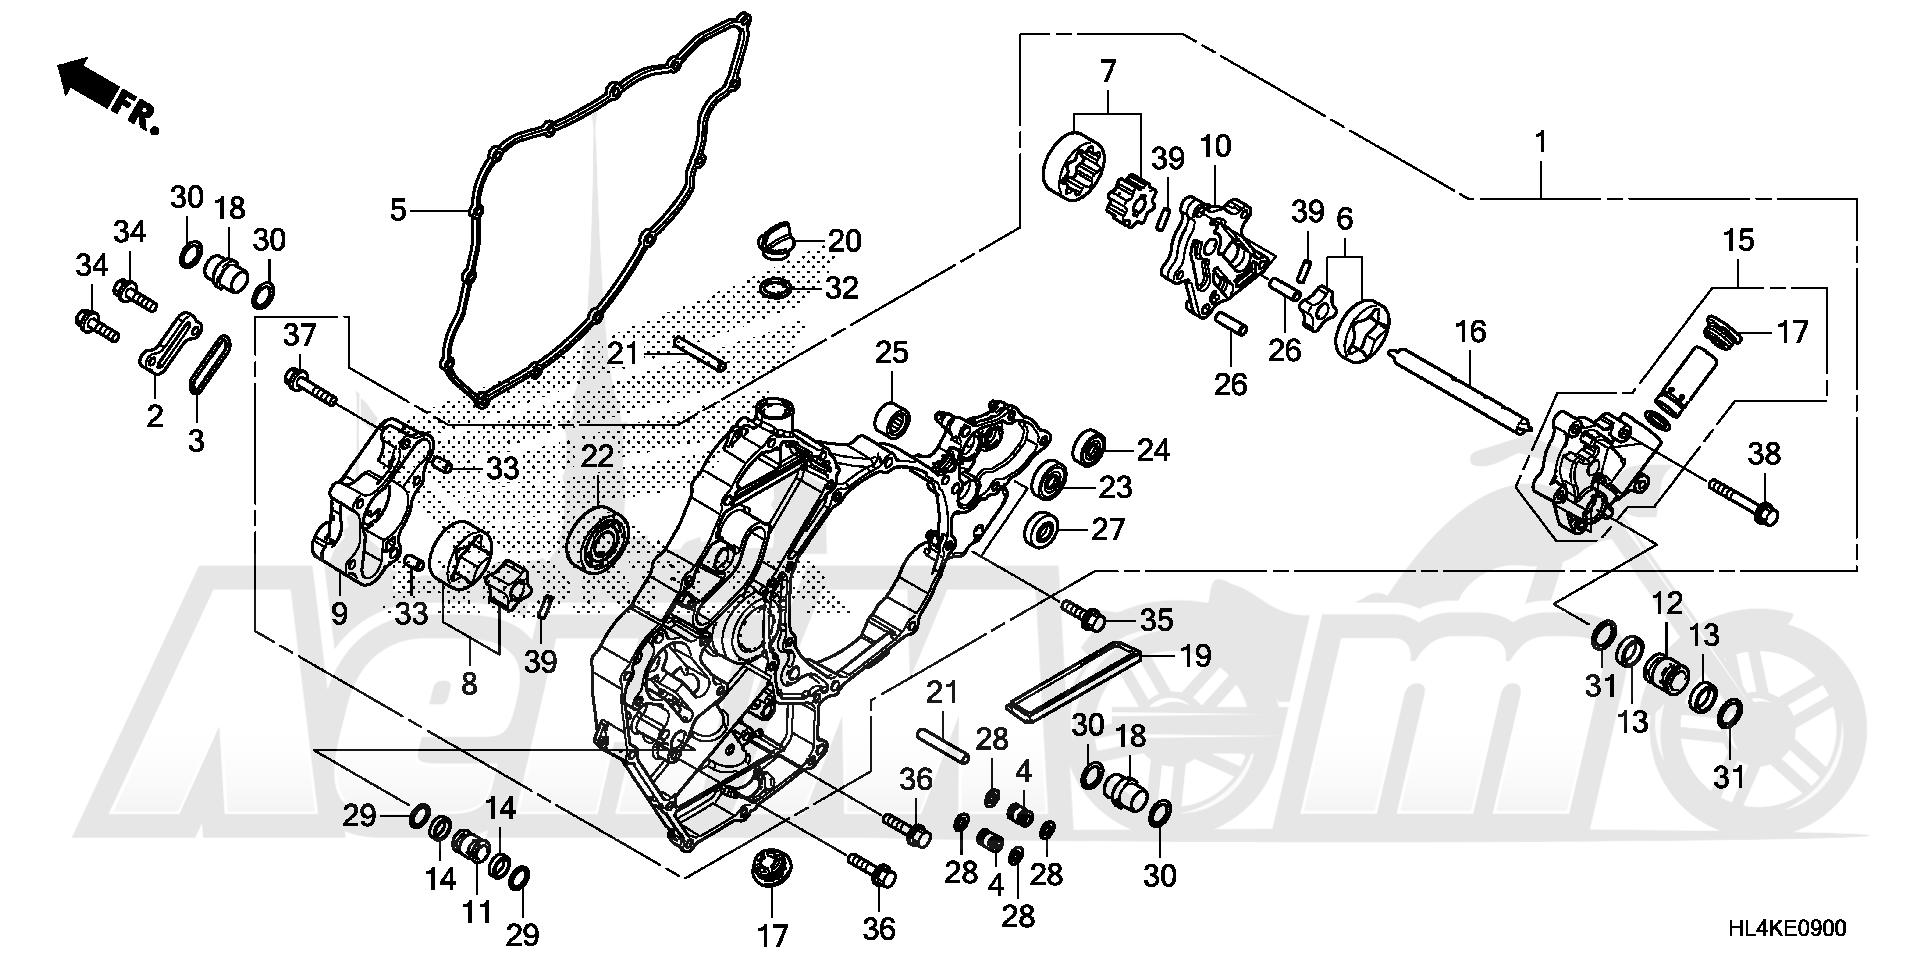 Запчасти для Квадроцикла Honda 2019 SXS1000M5L Раздел: OIL PUMP | маслянный насос